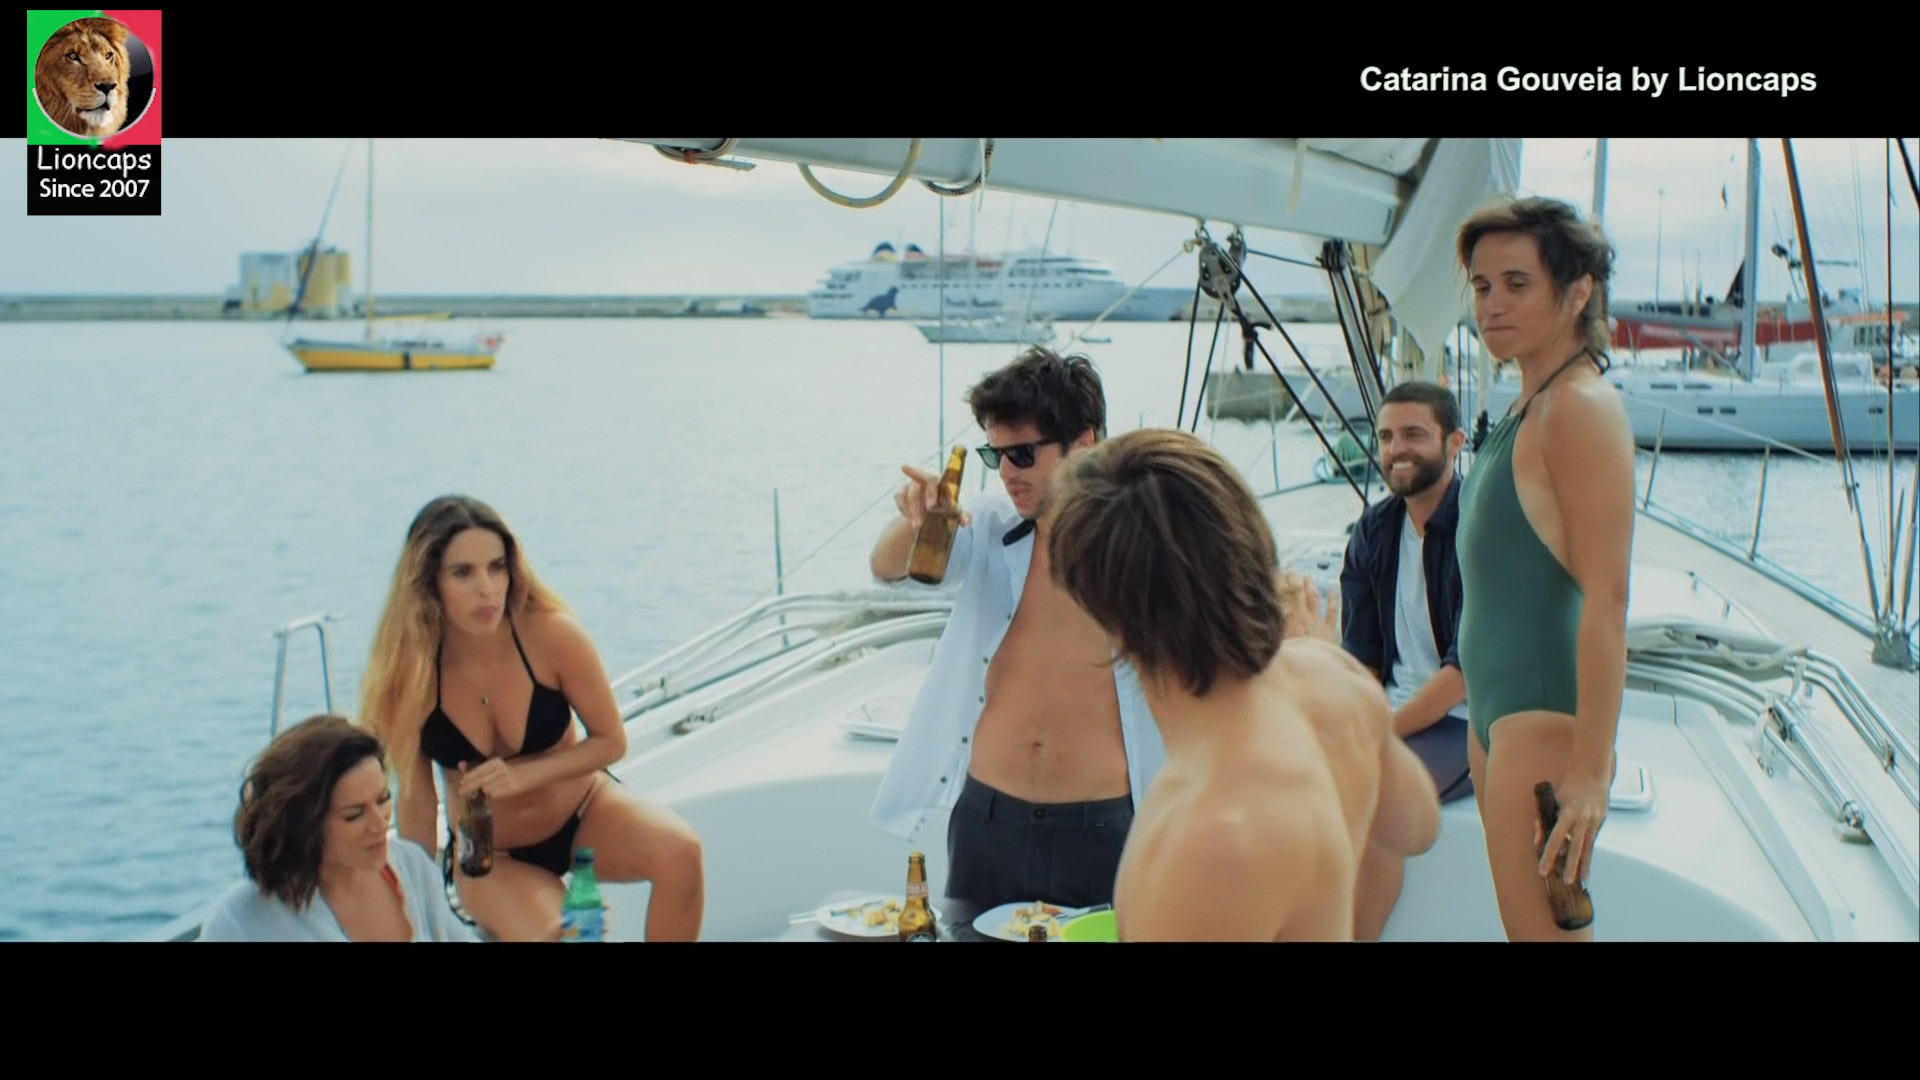 catarina_gouveia_perdidos_lioncaps_09_05_2021_07 (3).jpg